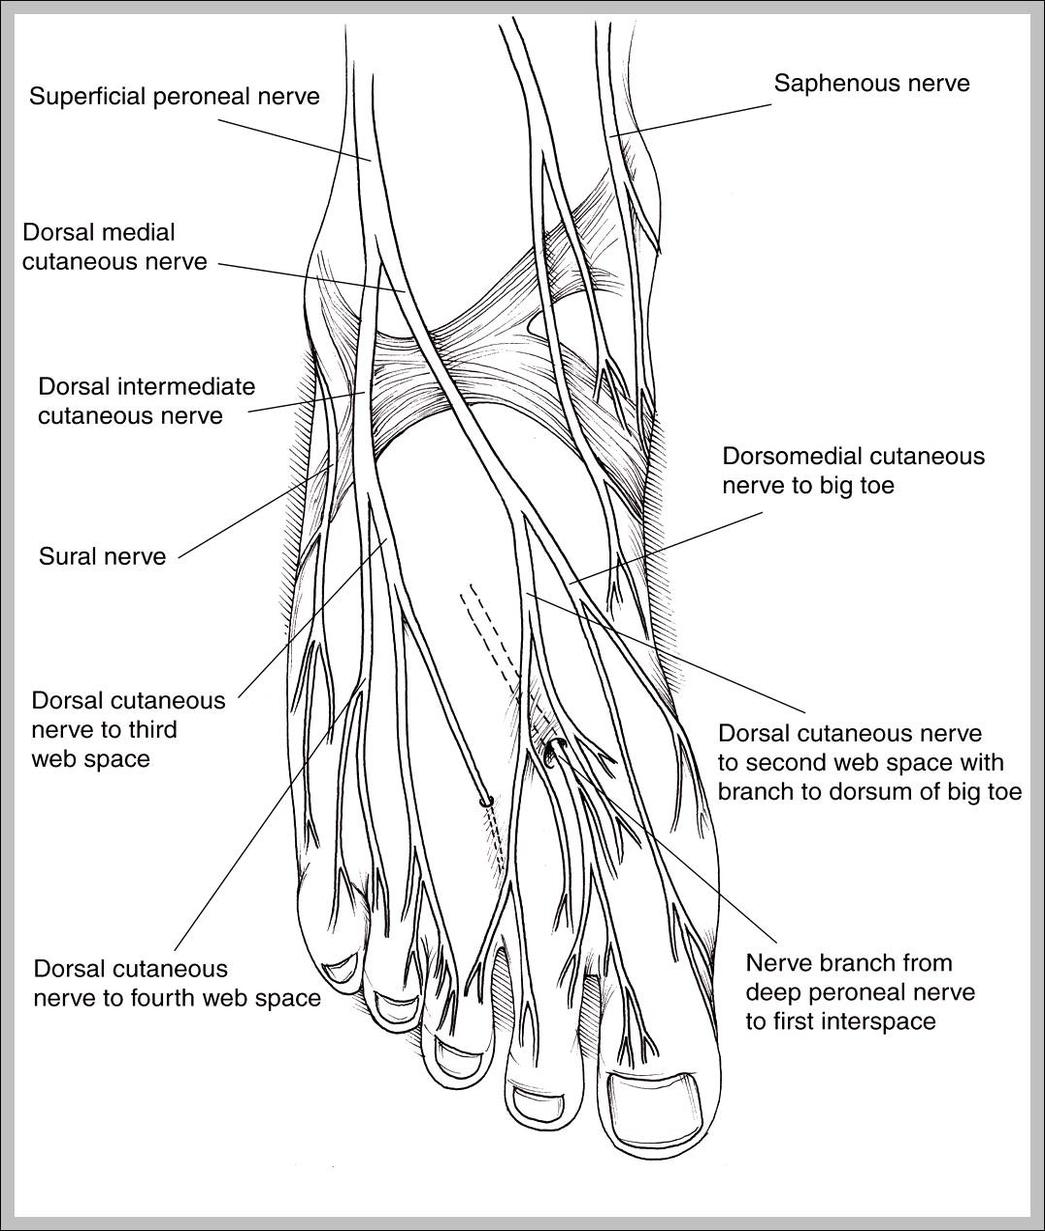 hight resolution of nervous system diagram graph diagram diagram of nerves in human body diagram of nerves in human body